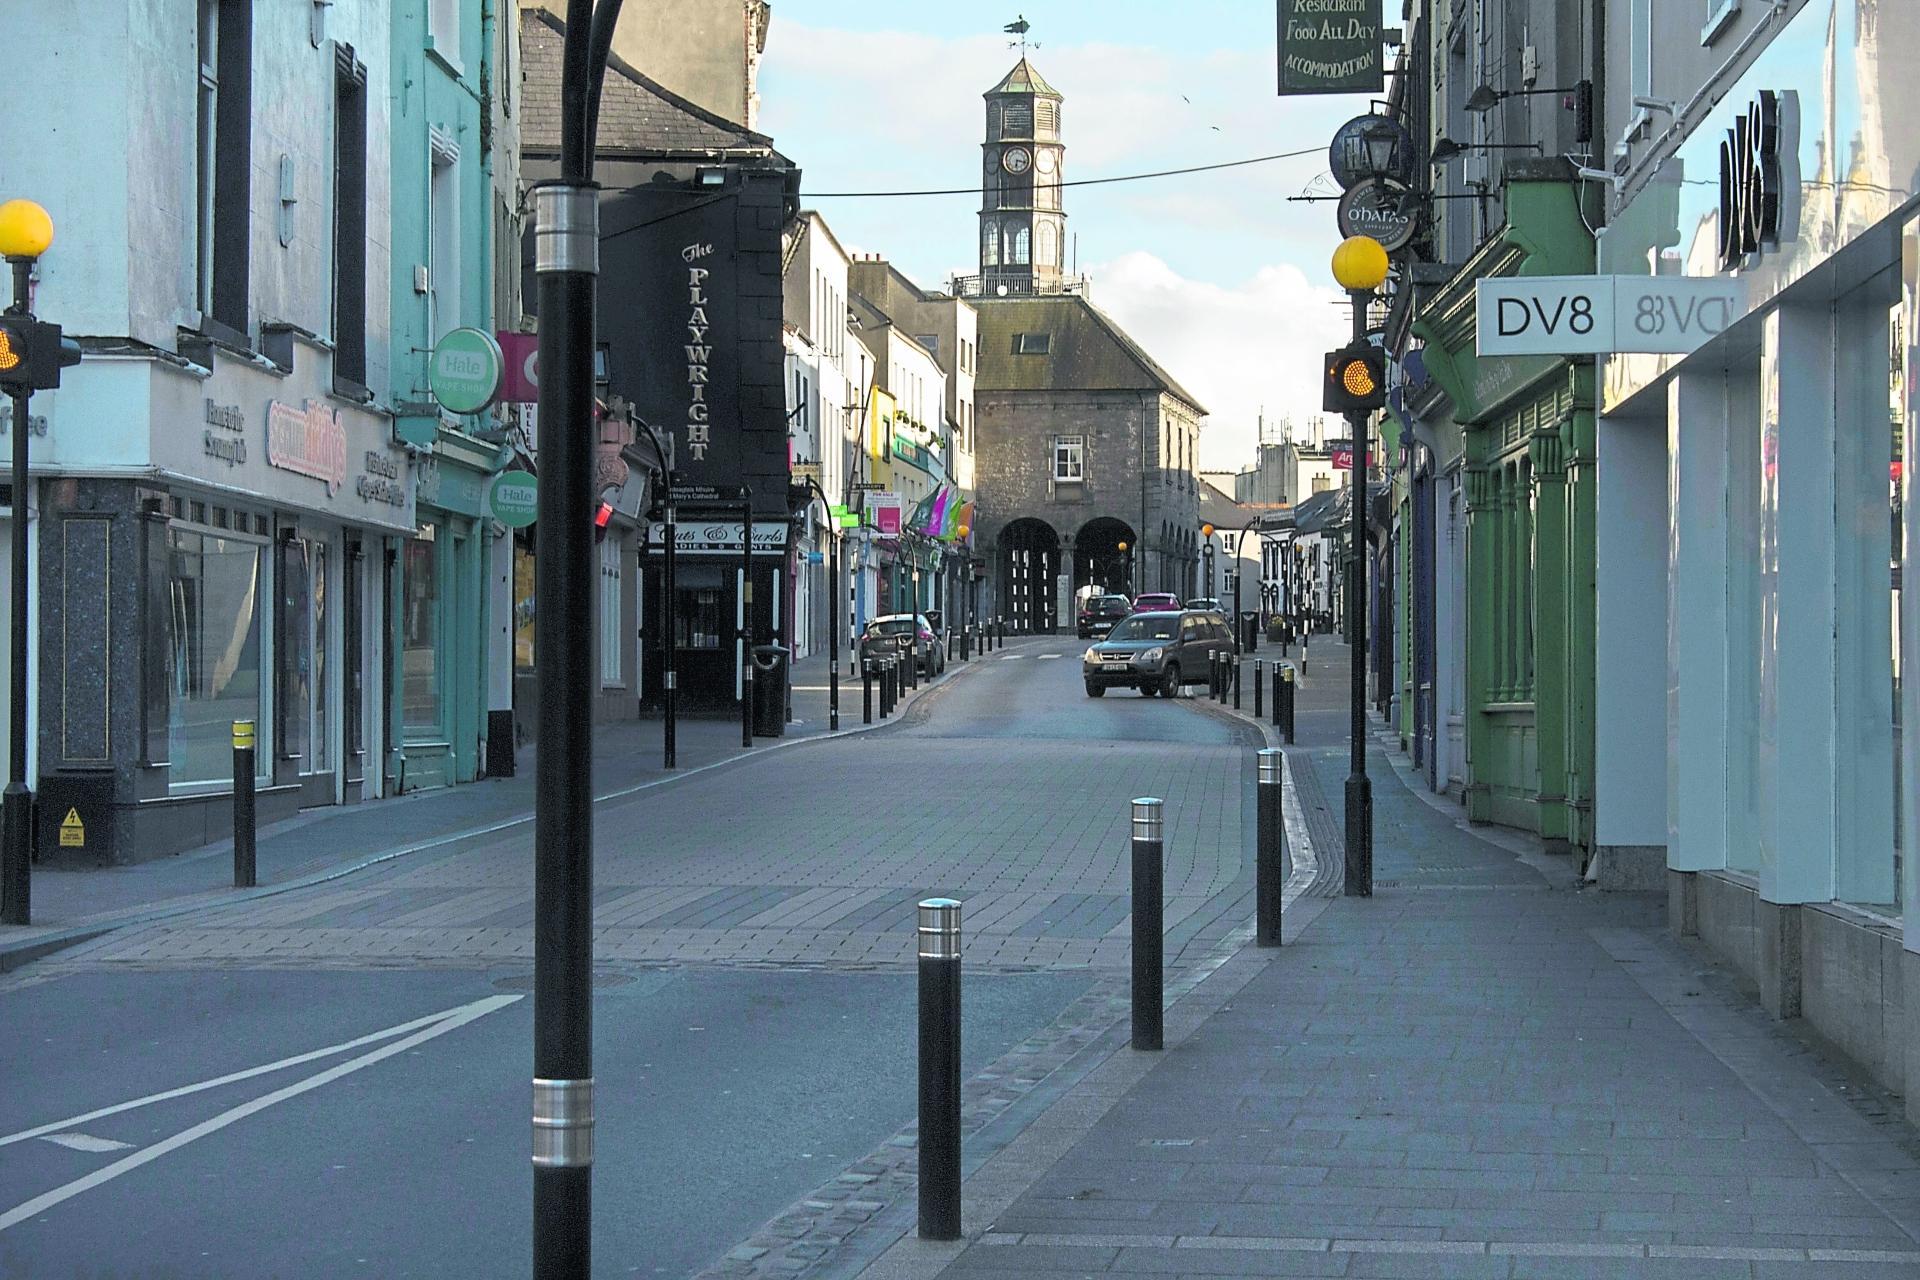 Kilkenny dating site - free online dating in Kilkenny (Ireland)